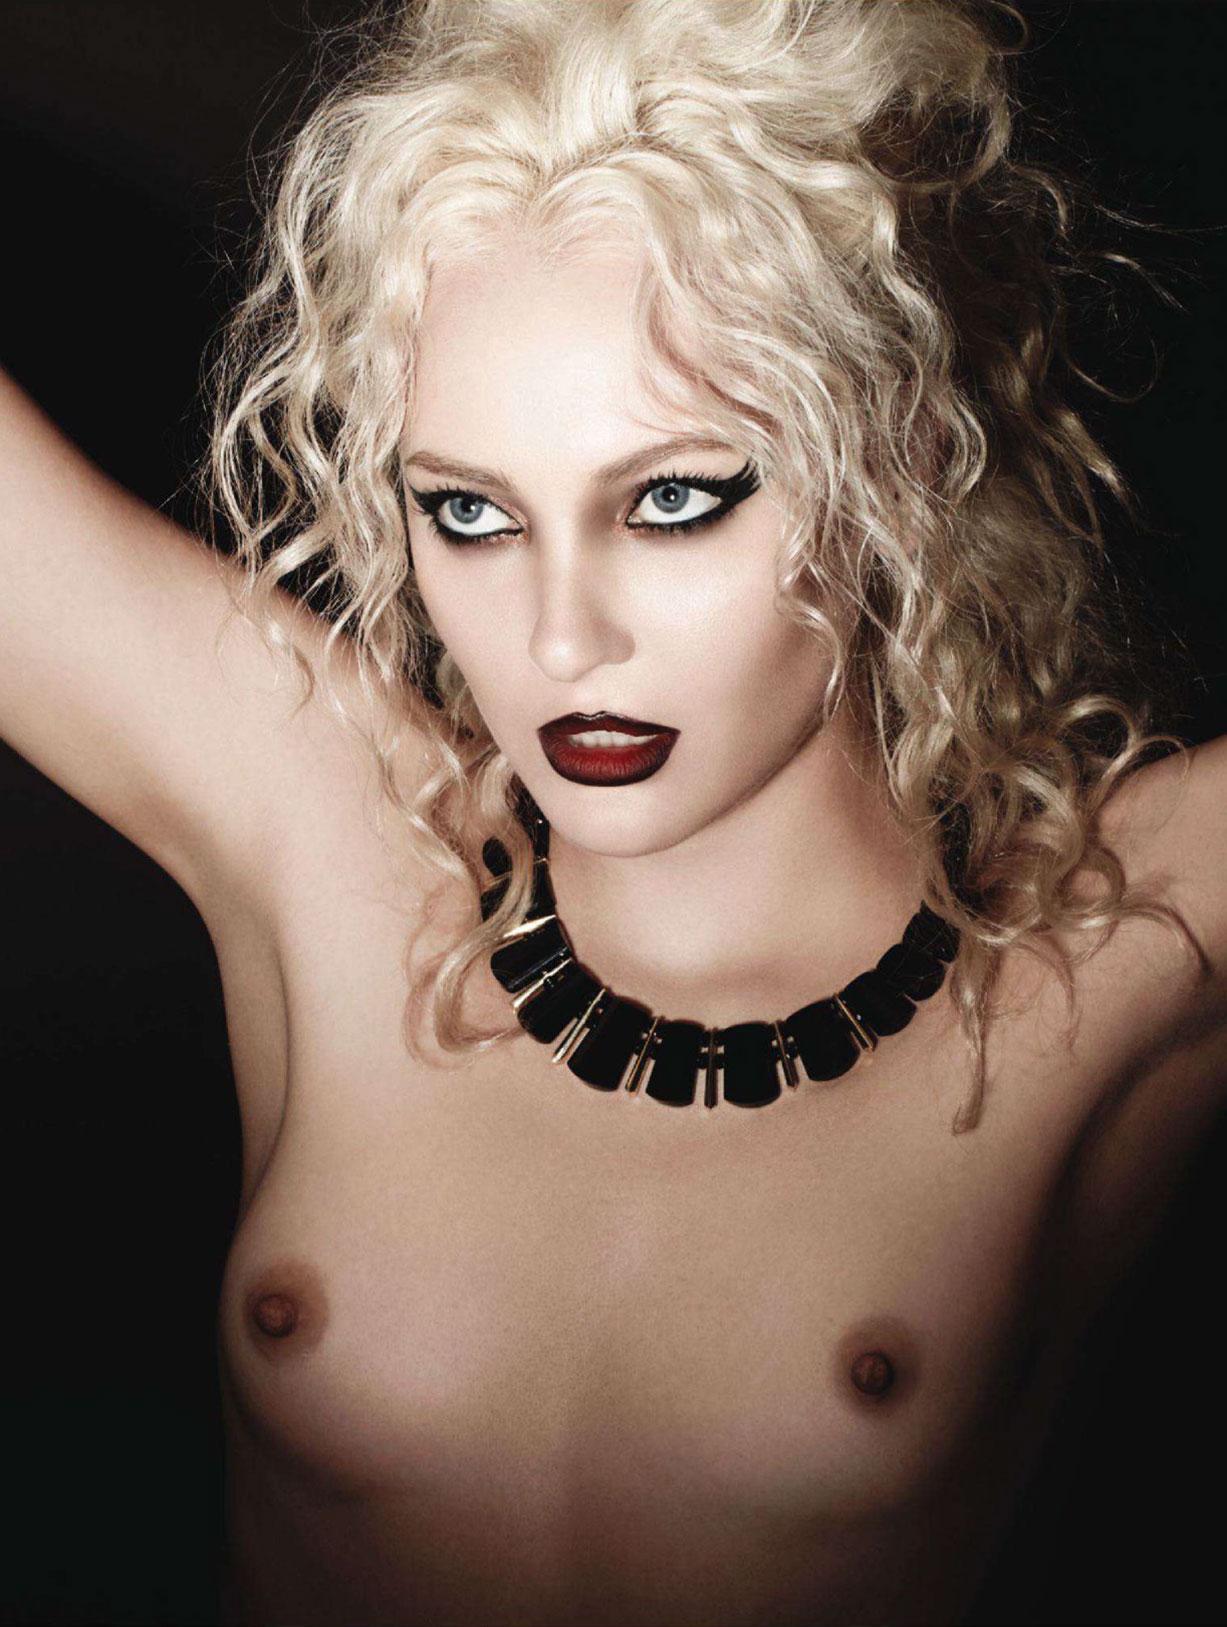 Brooke Bonelli naked by Steve Shaw / Treats! Magazine, issue 1, spring 2011